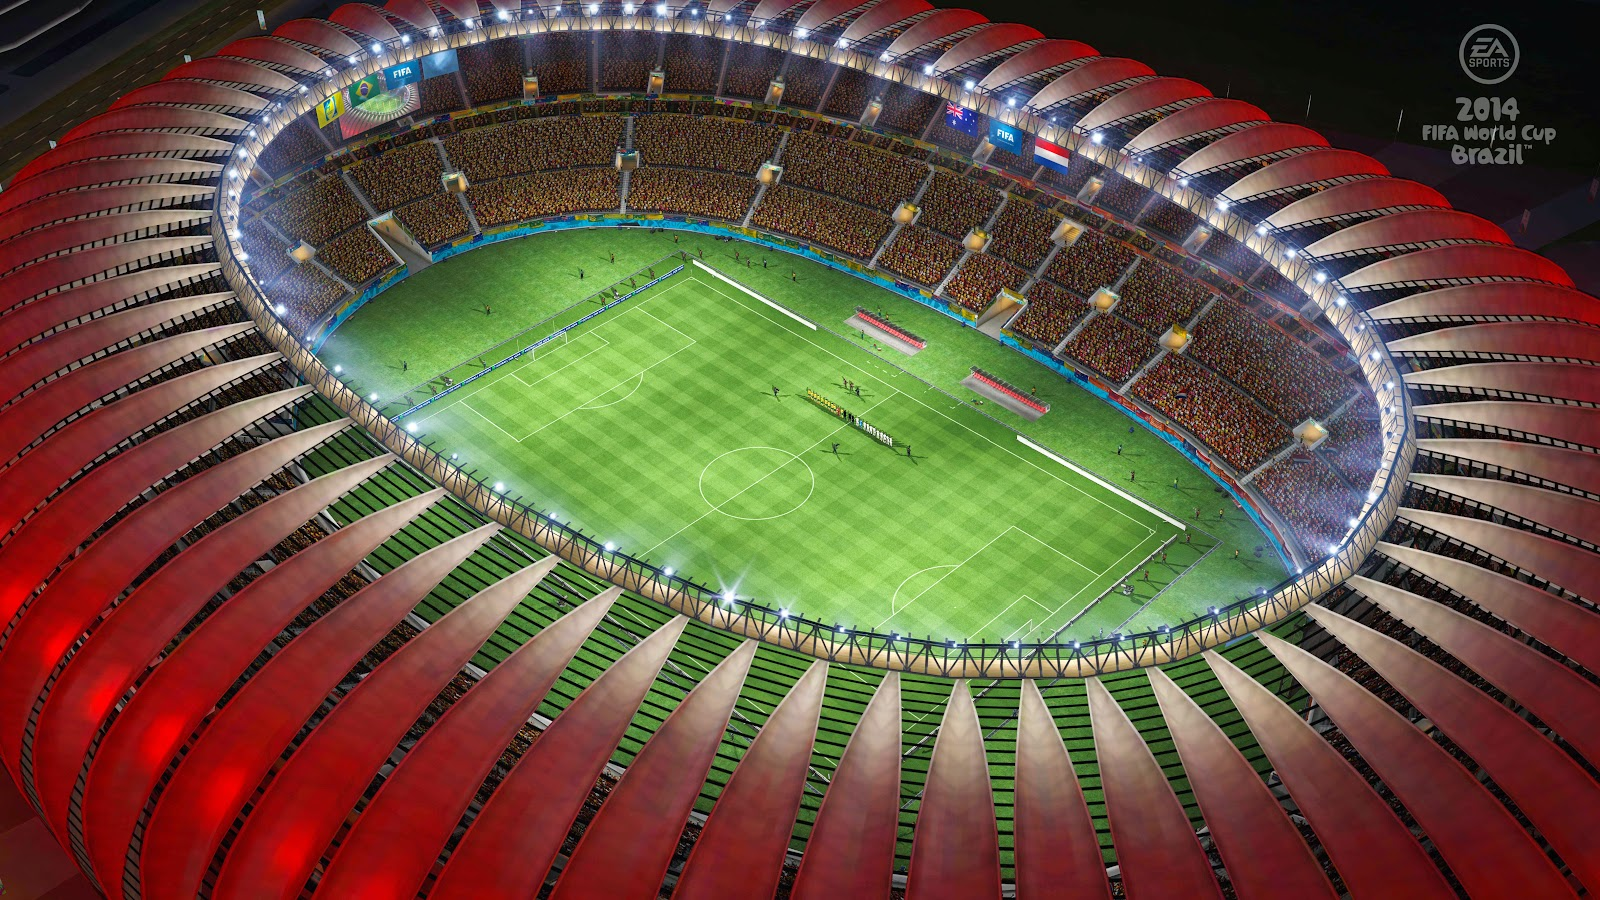 http://2.bp.blogspot.com/-MxiVL7edfMM/U6bvVZkdIjI/AAAAAAAAZ3M/zsm5eegmbhk/s1600/FIFAWorldCup2014_Xbox360_Beira_Rio_HiRes.jpg